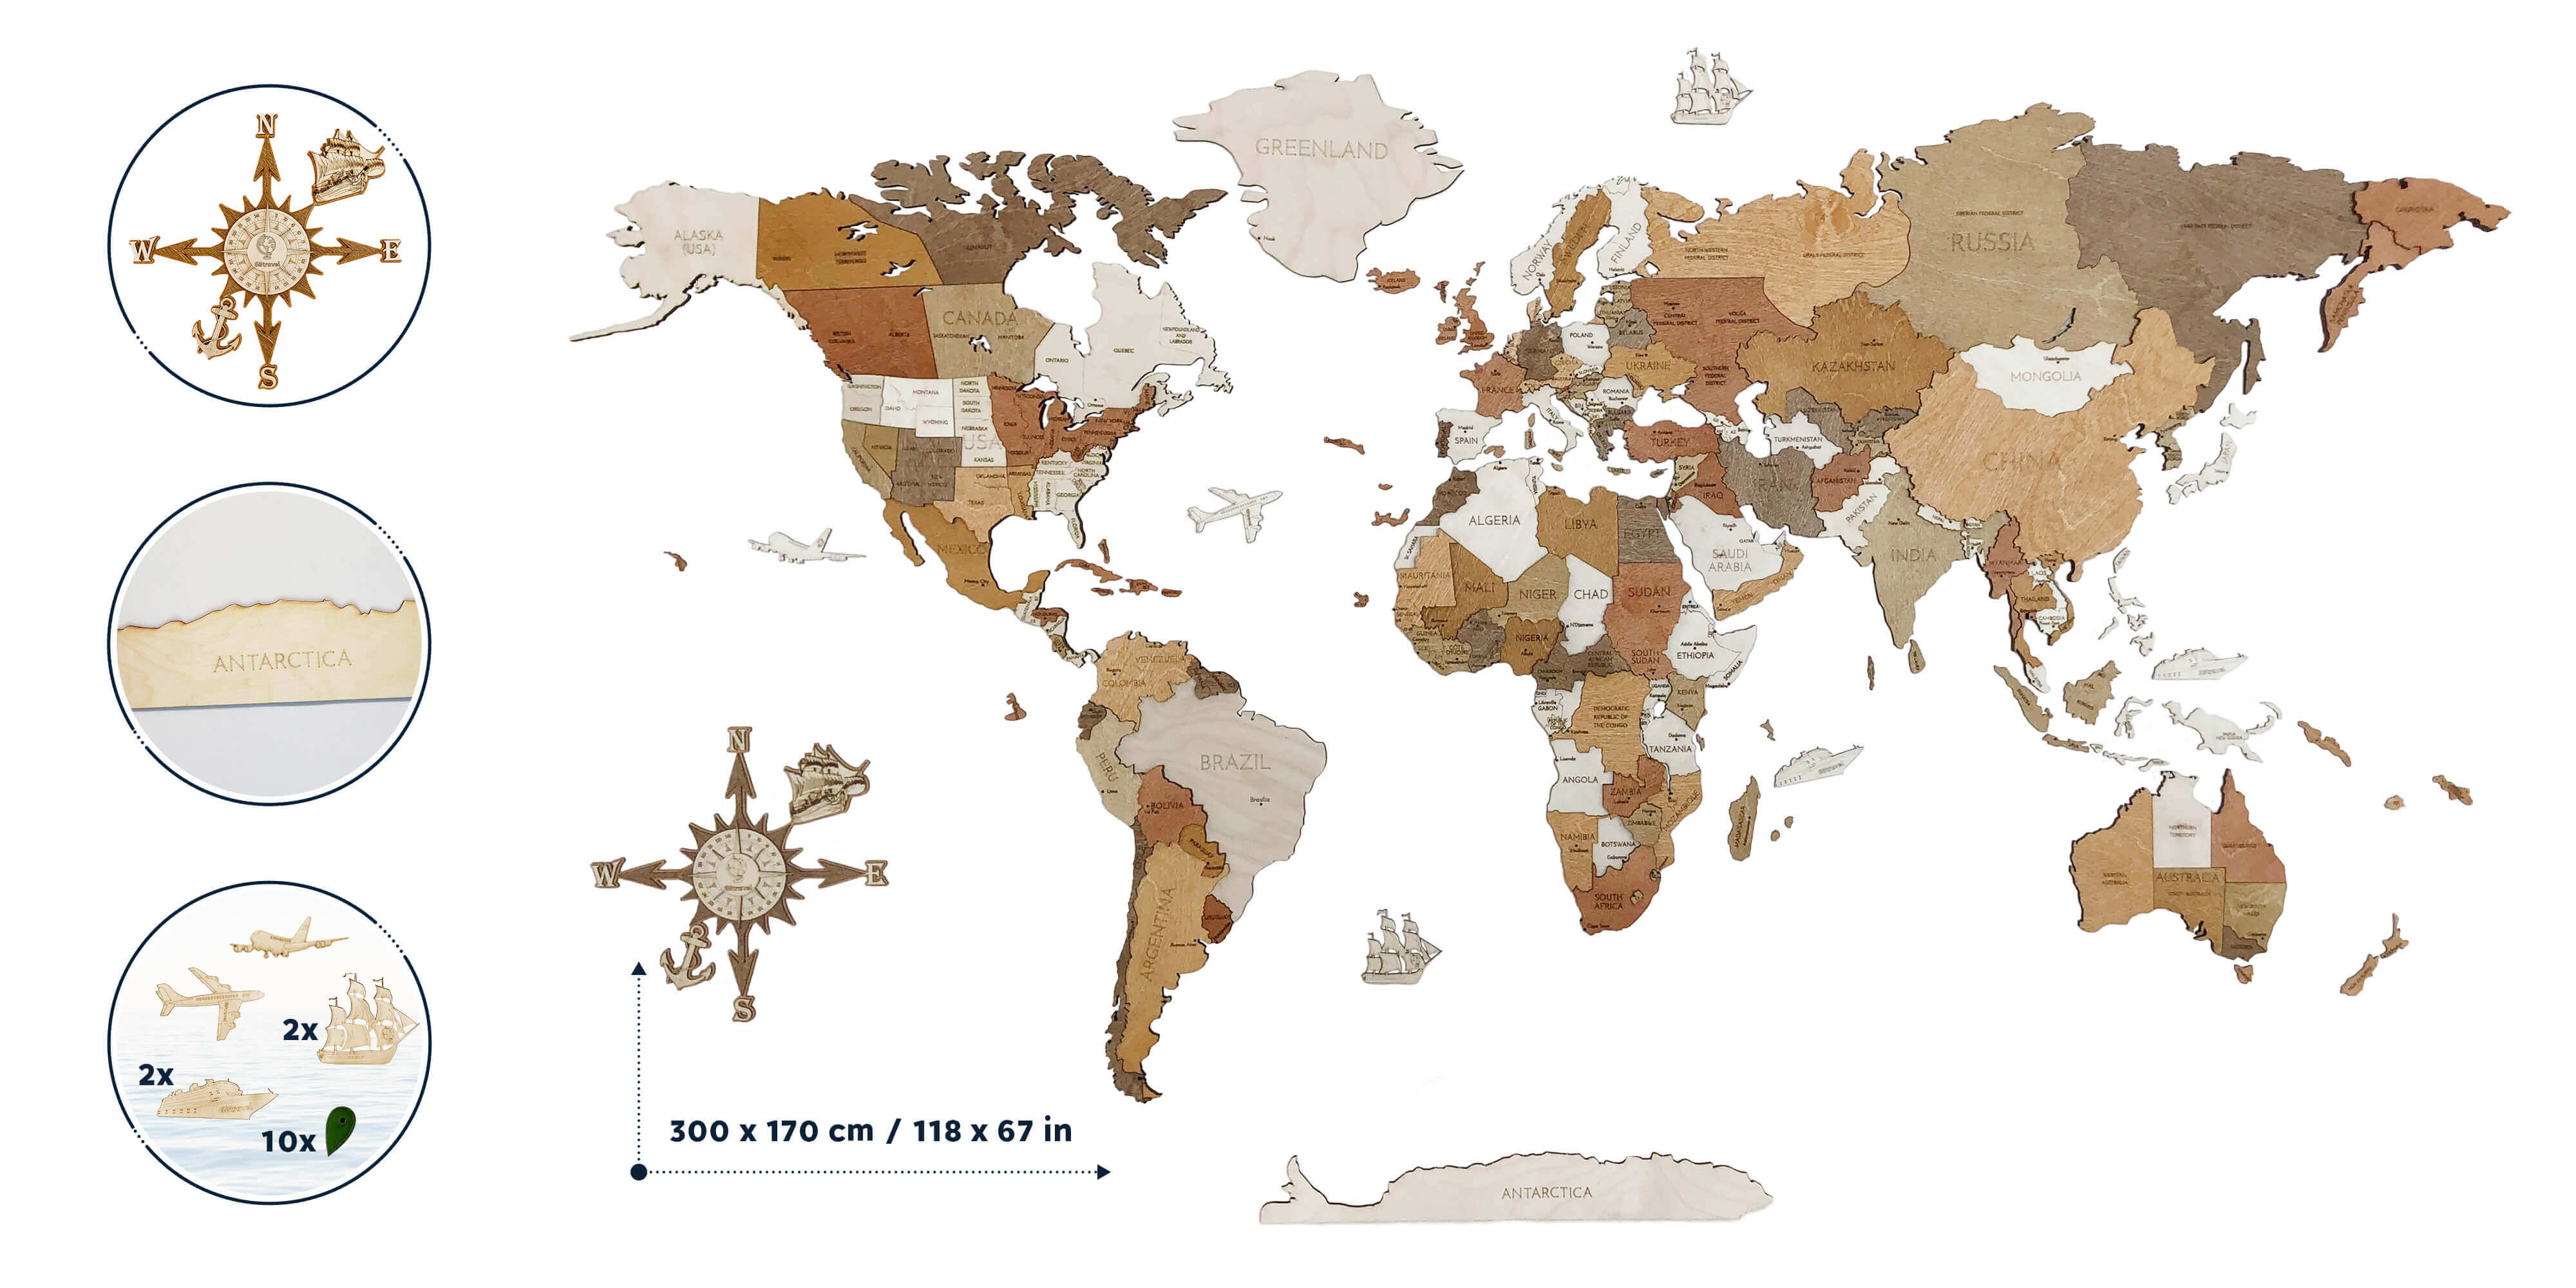 Drevená mapa sveta MEGA Antarctica (rozmer 300 x 170 cm)